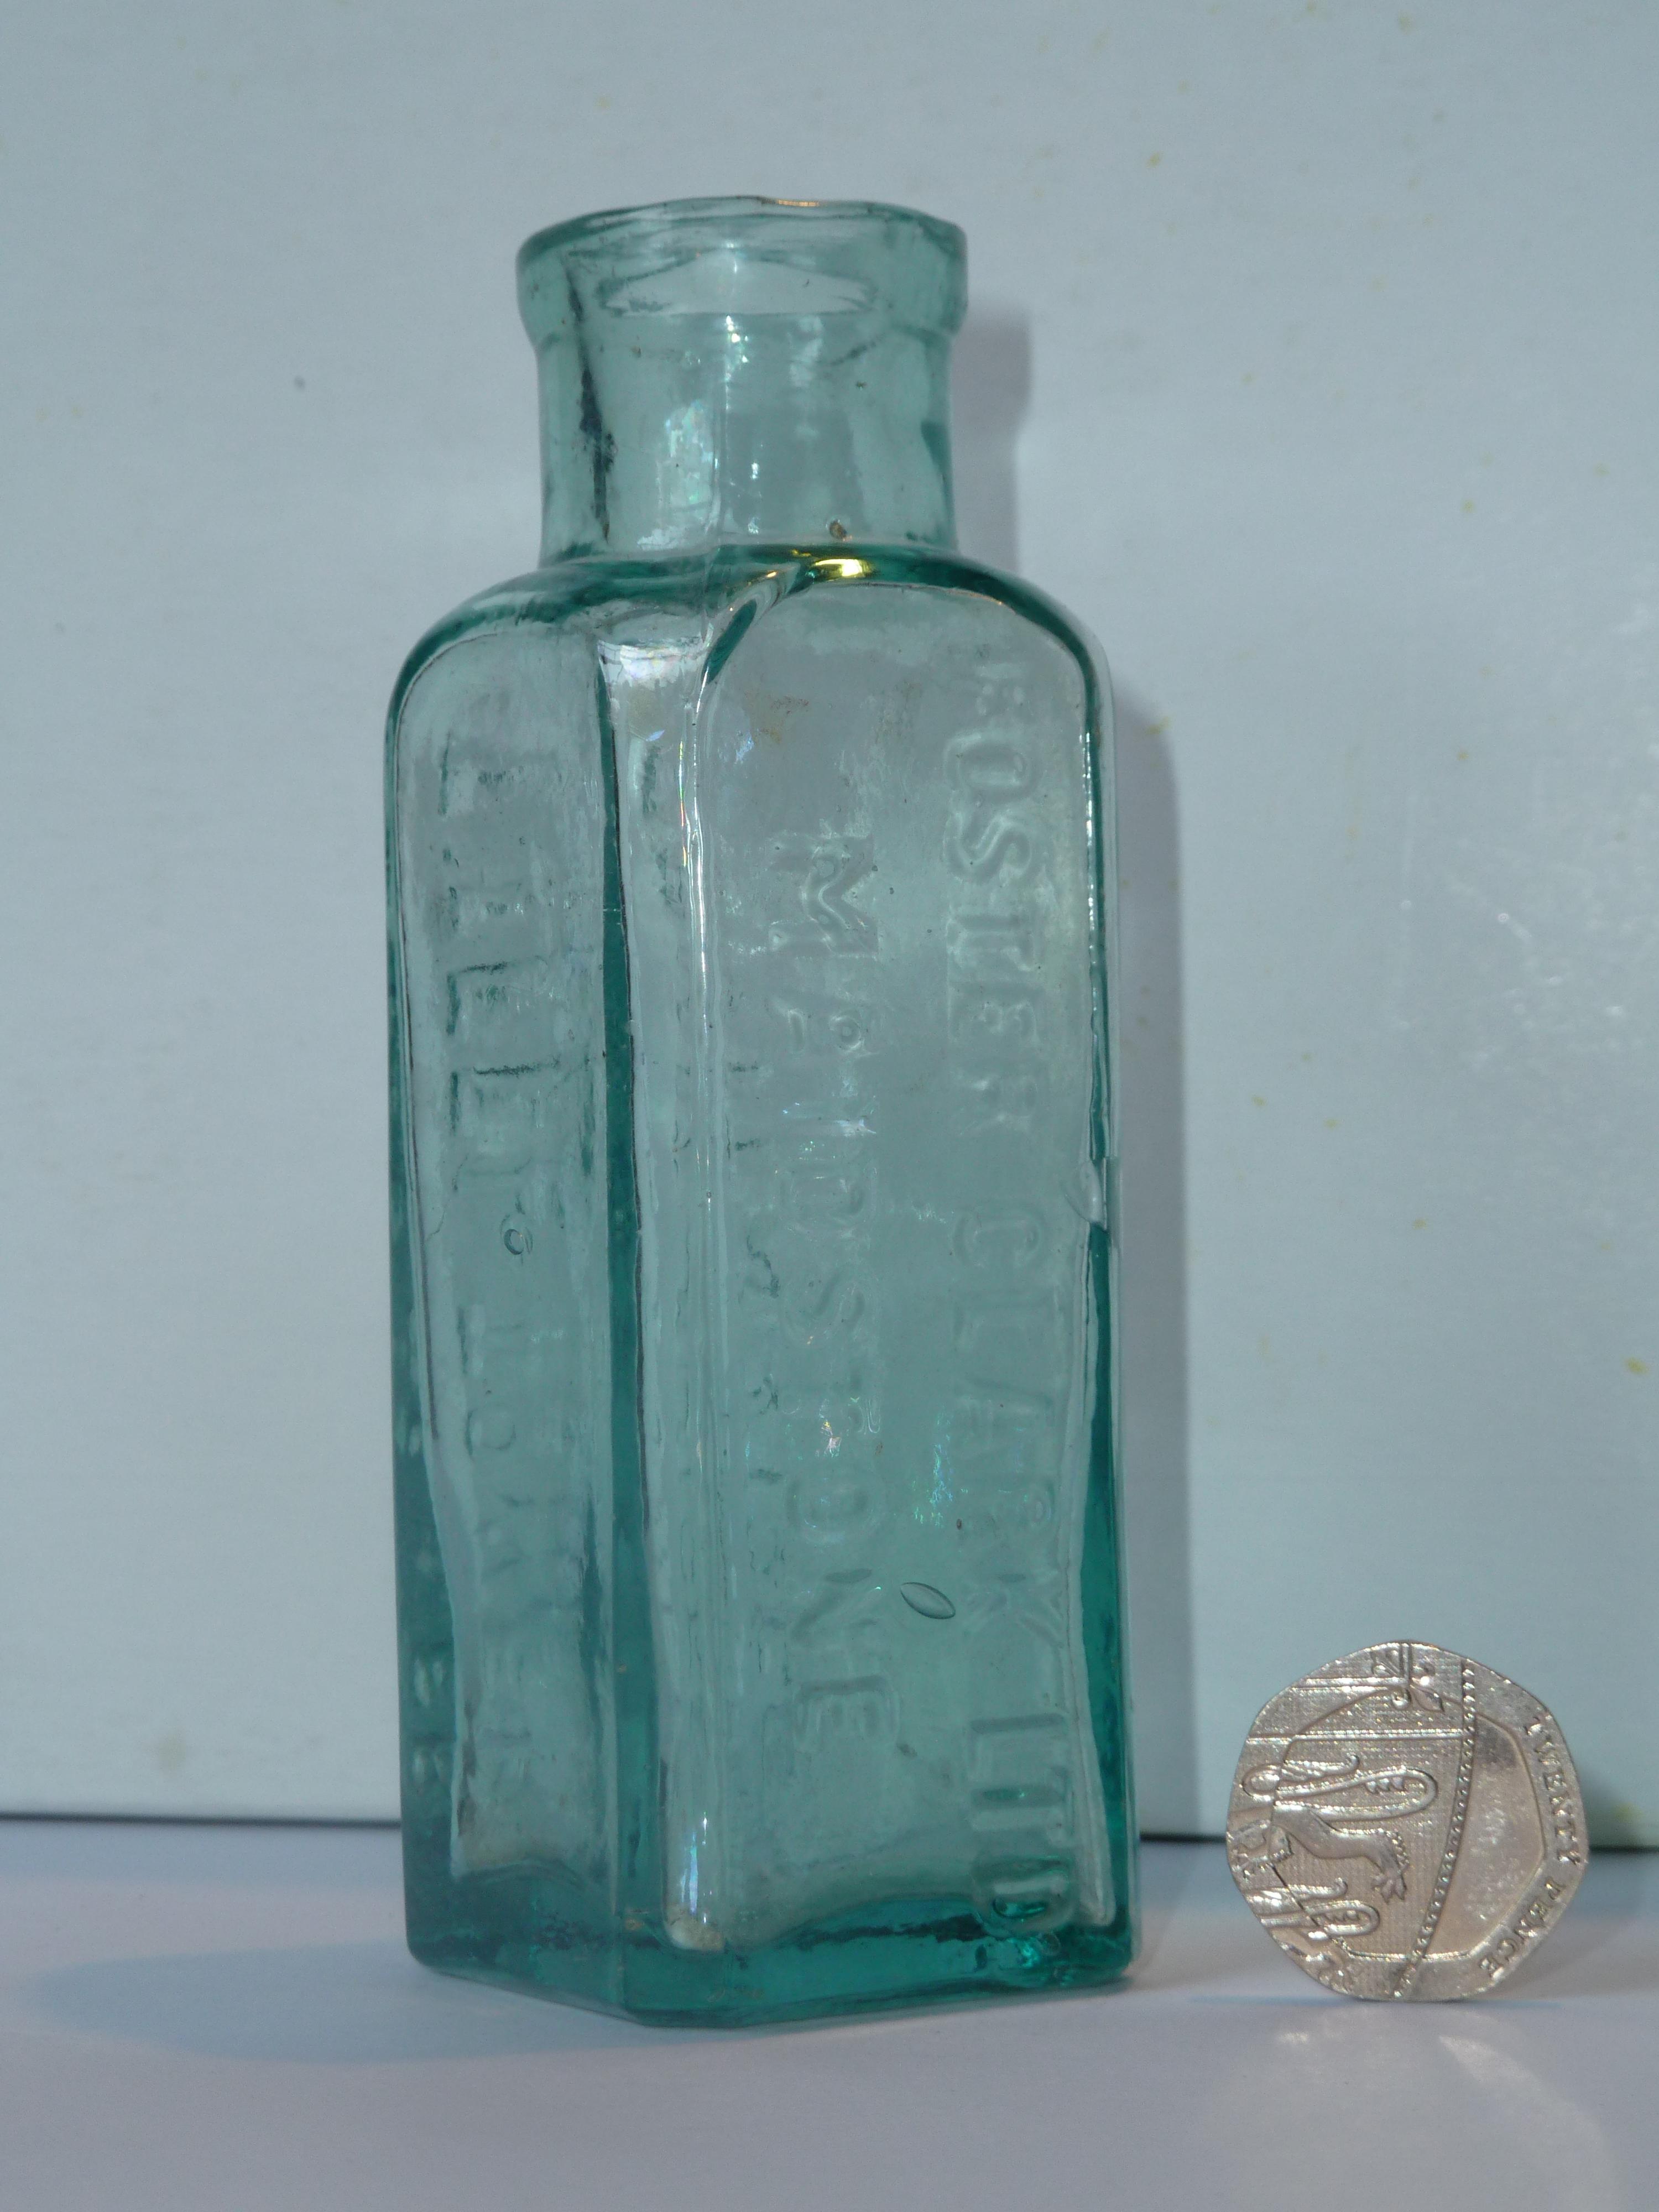 Foster Clark Fruit Juices Bottle